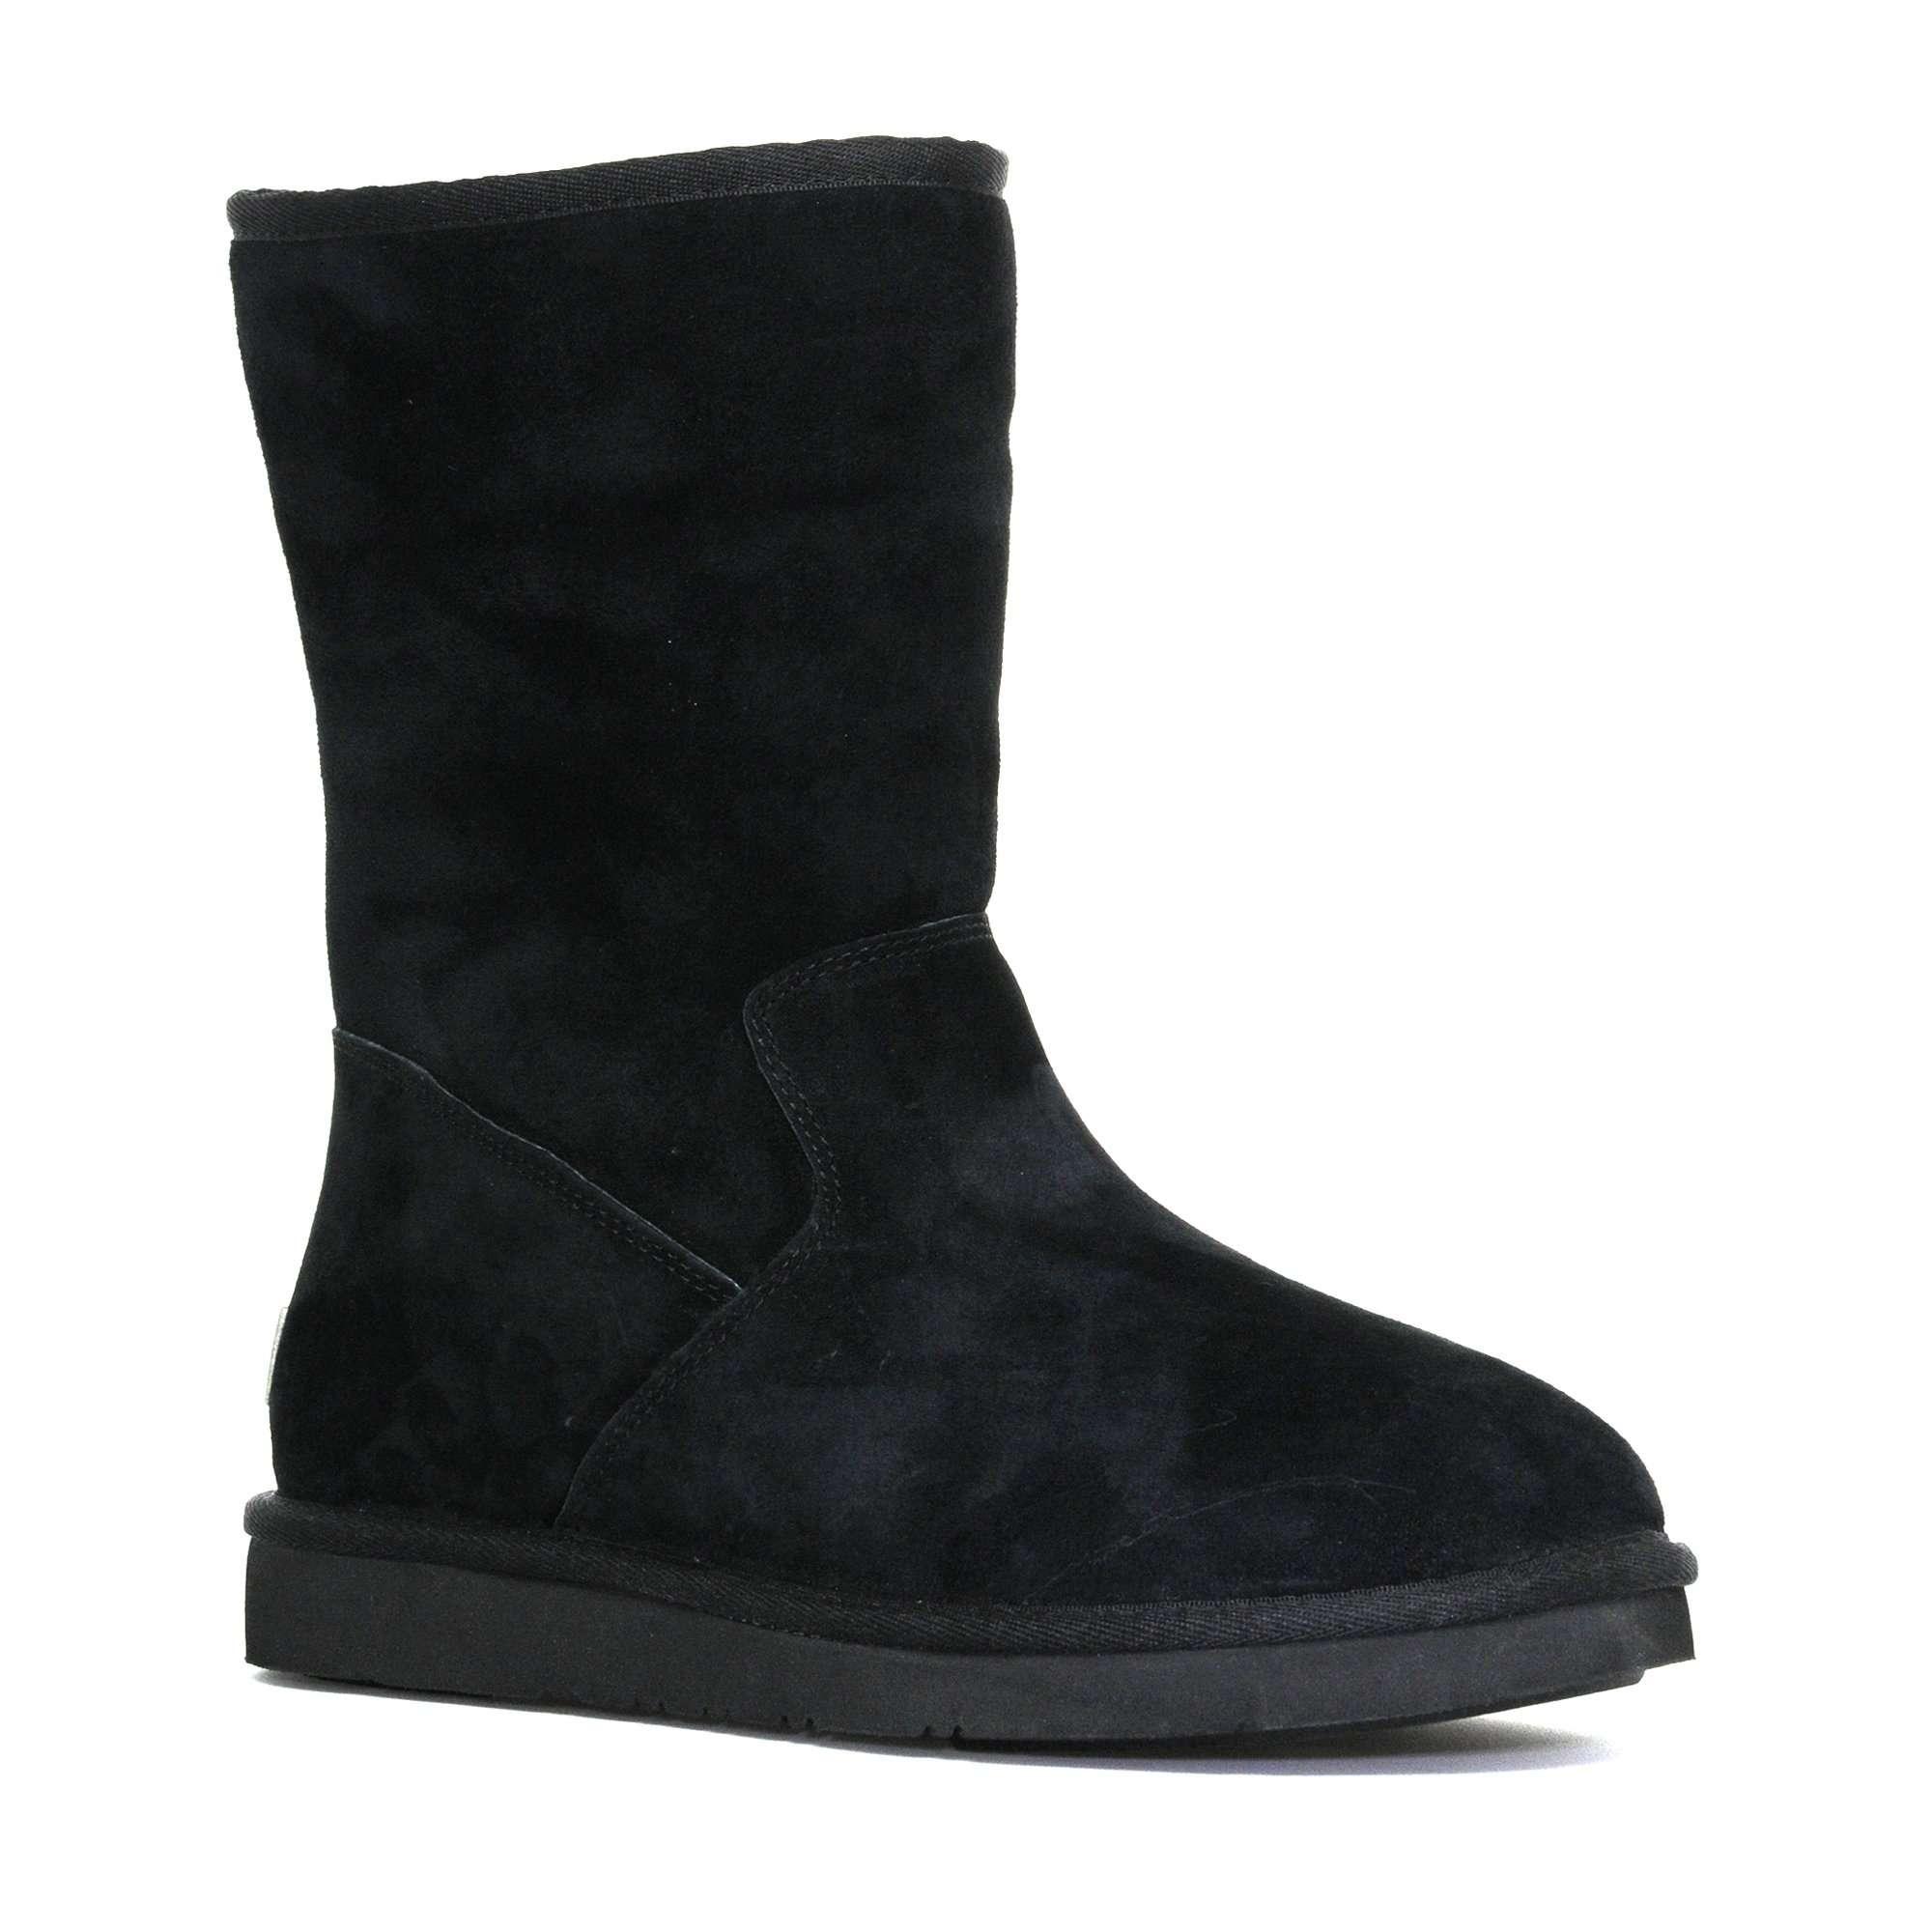 UGG Women's Pierce Winter Boot